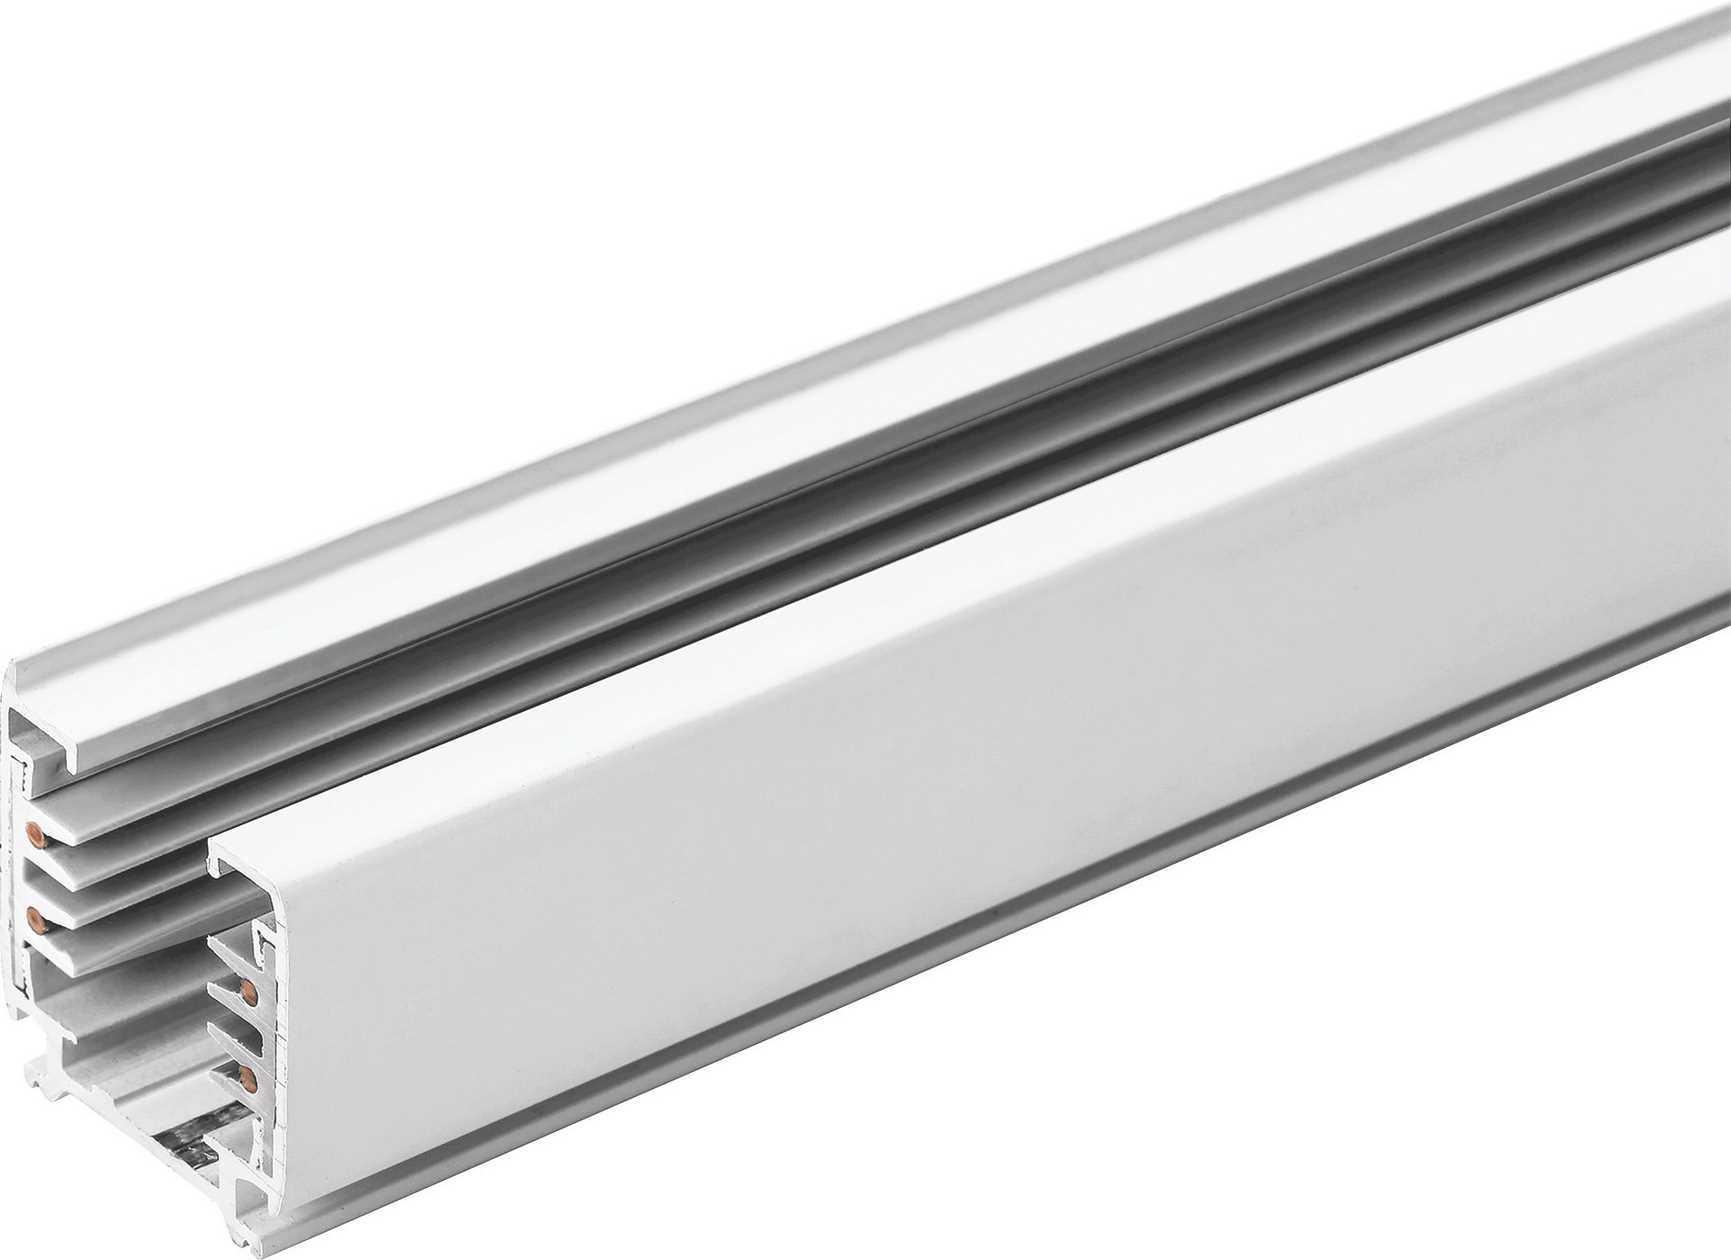 Greenlux TRACK PROFILE 4W WHITE 1000mm GXTR005